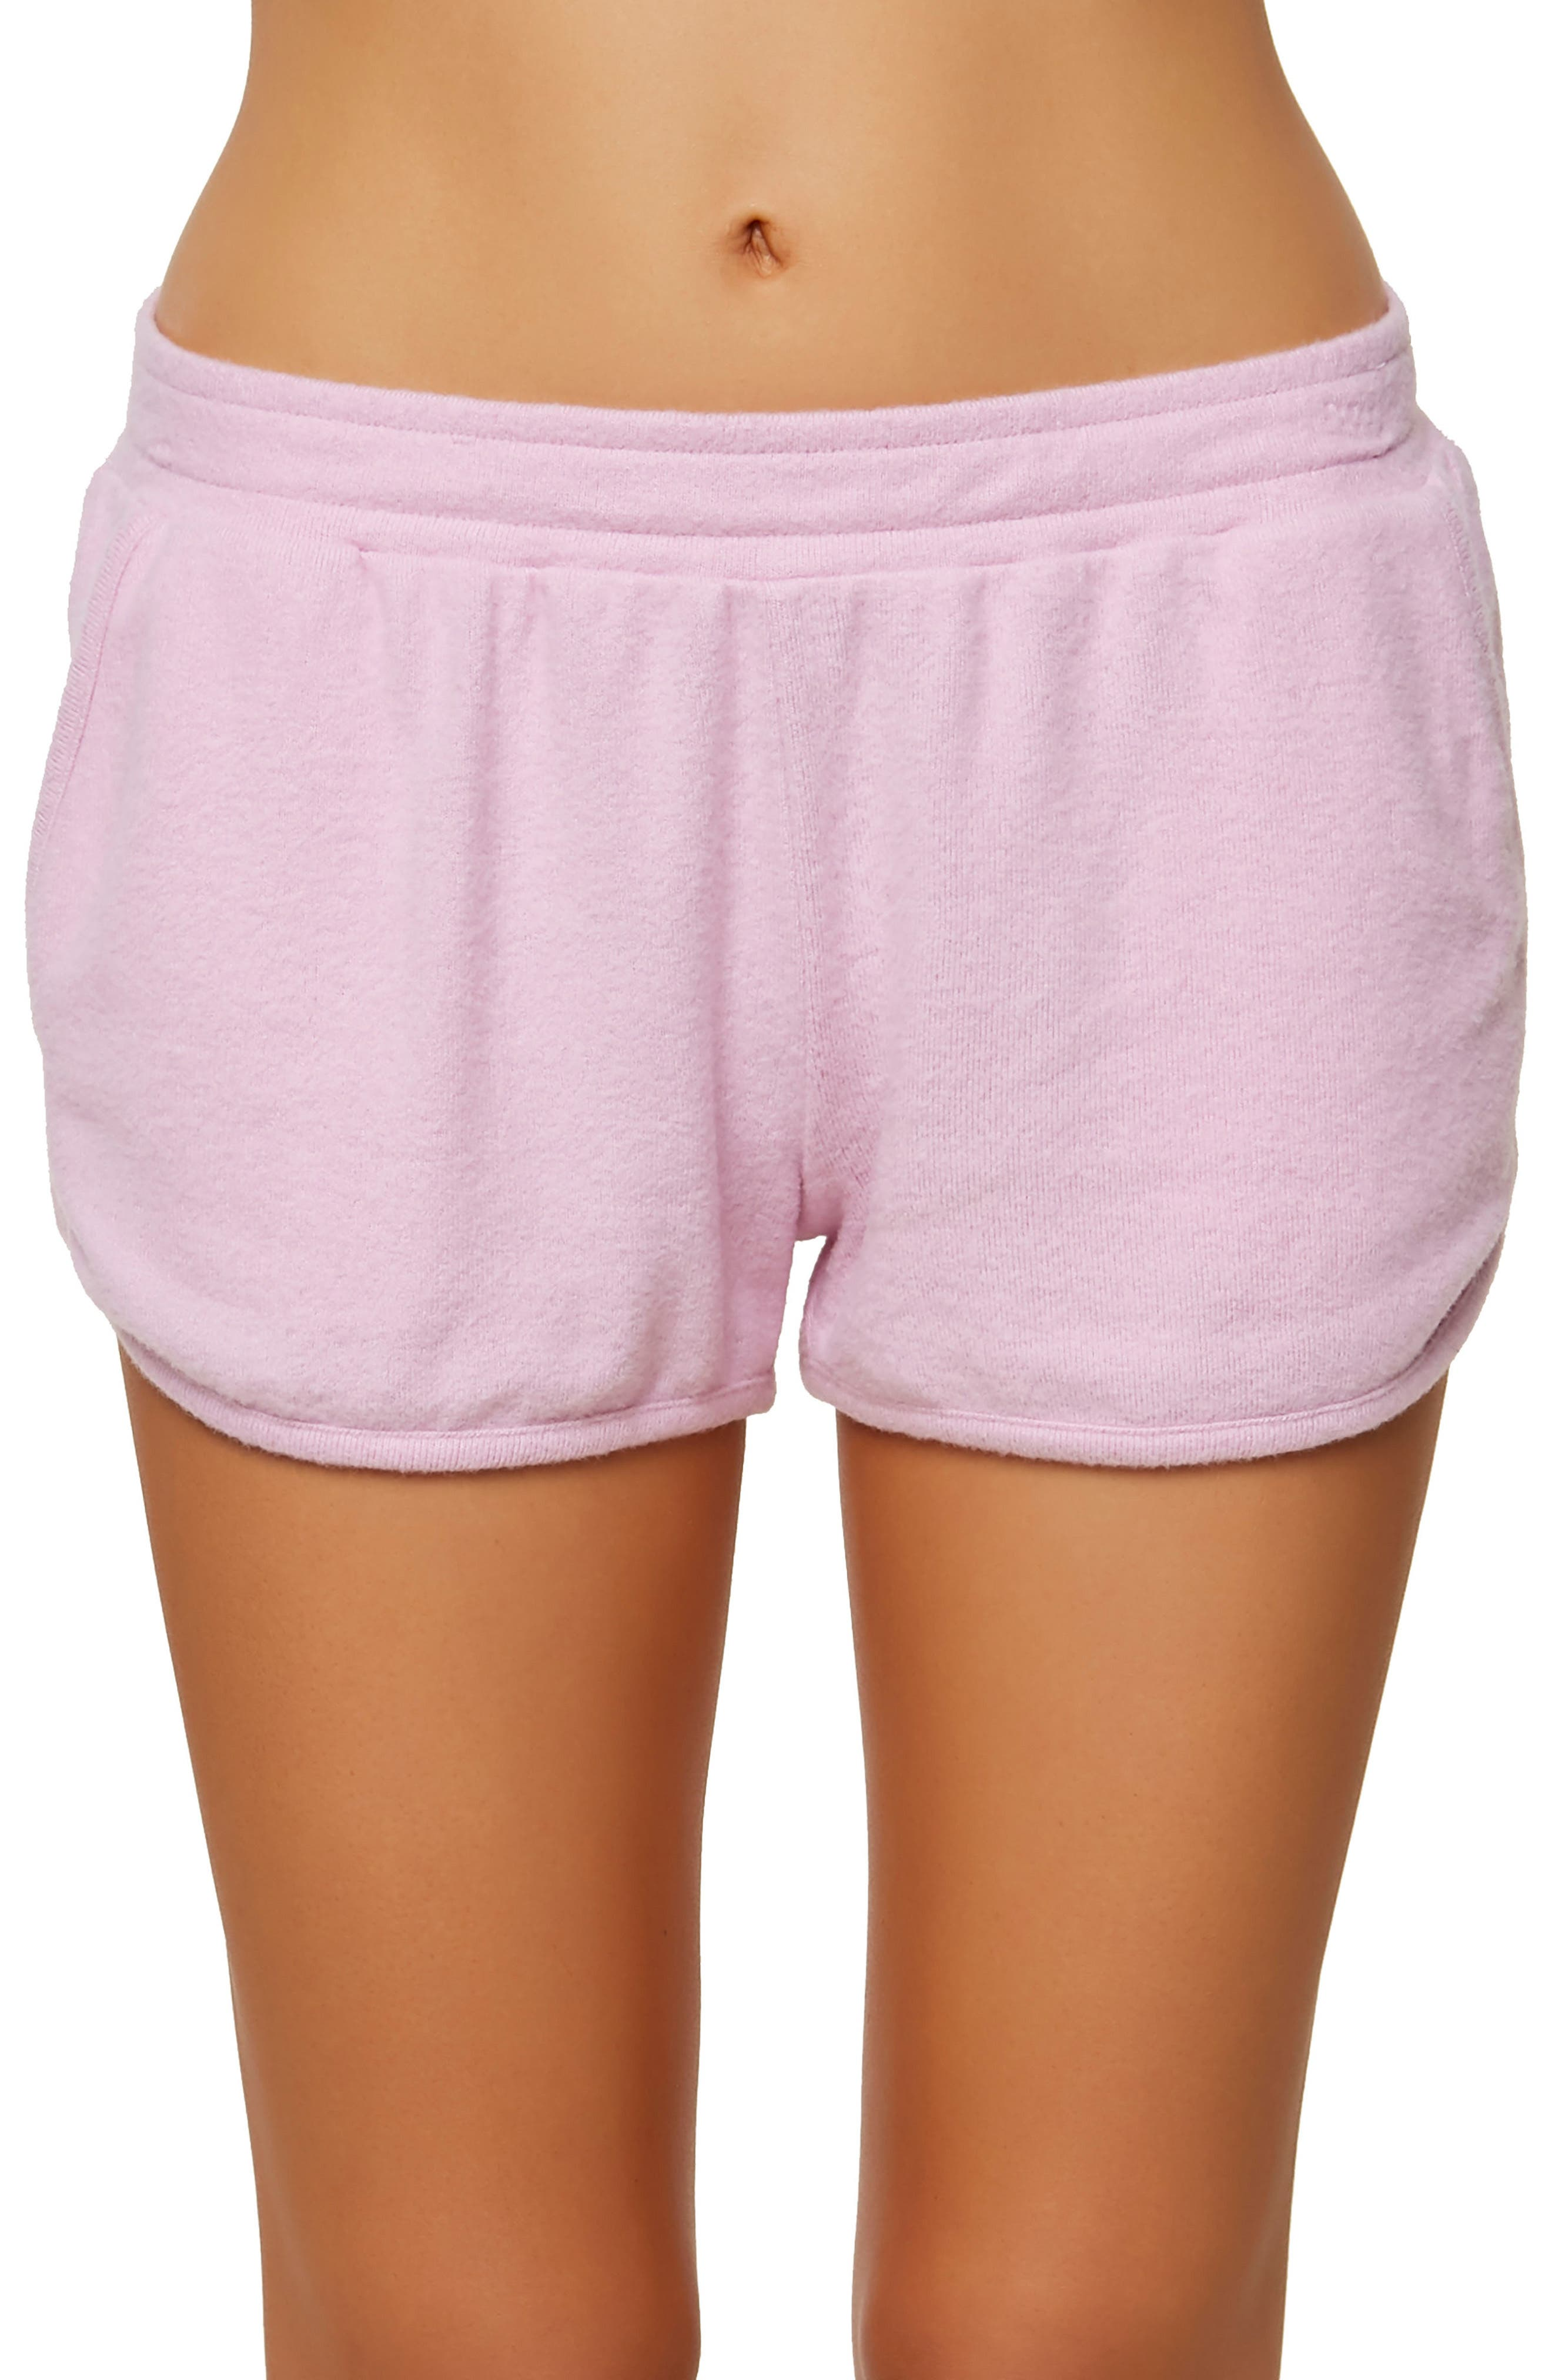 Costa Fleece Dolphin Shorts,                             Main thumbnail 1, color,                             Pastel Lavender